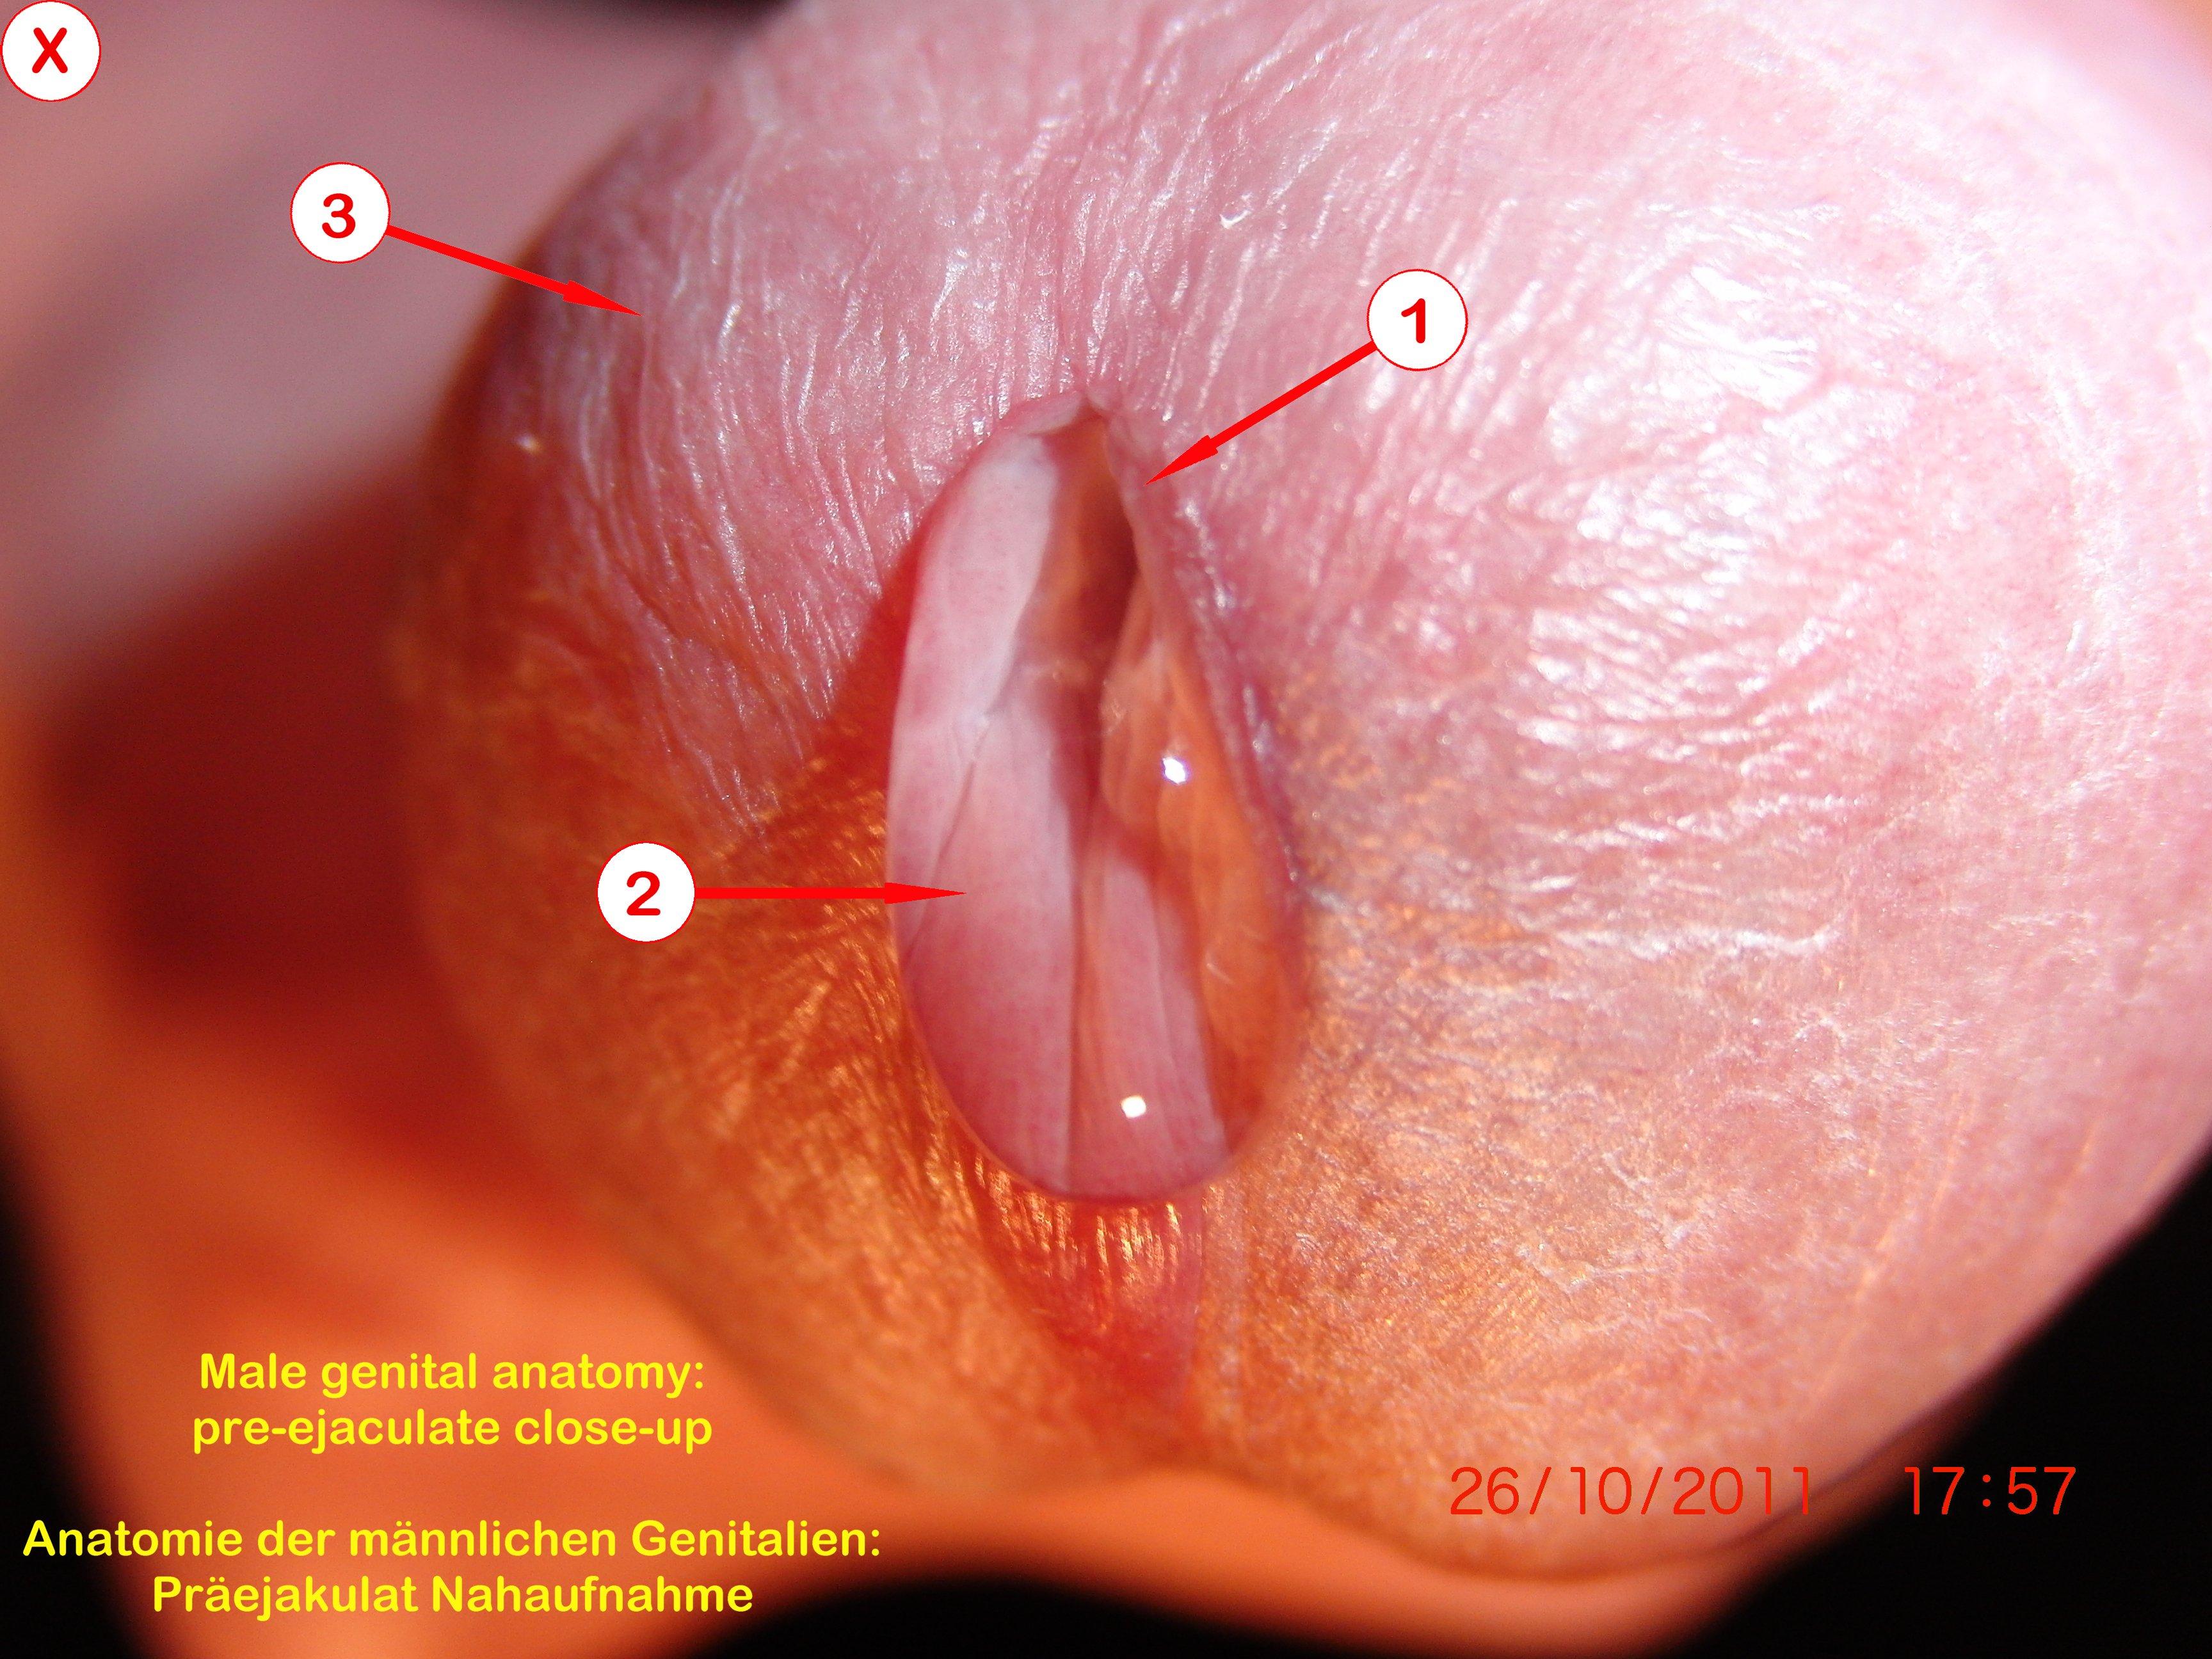 Urethral sounding cumming hard and deep penetration 9